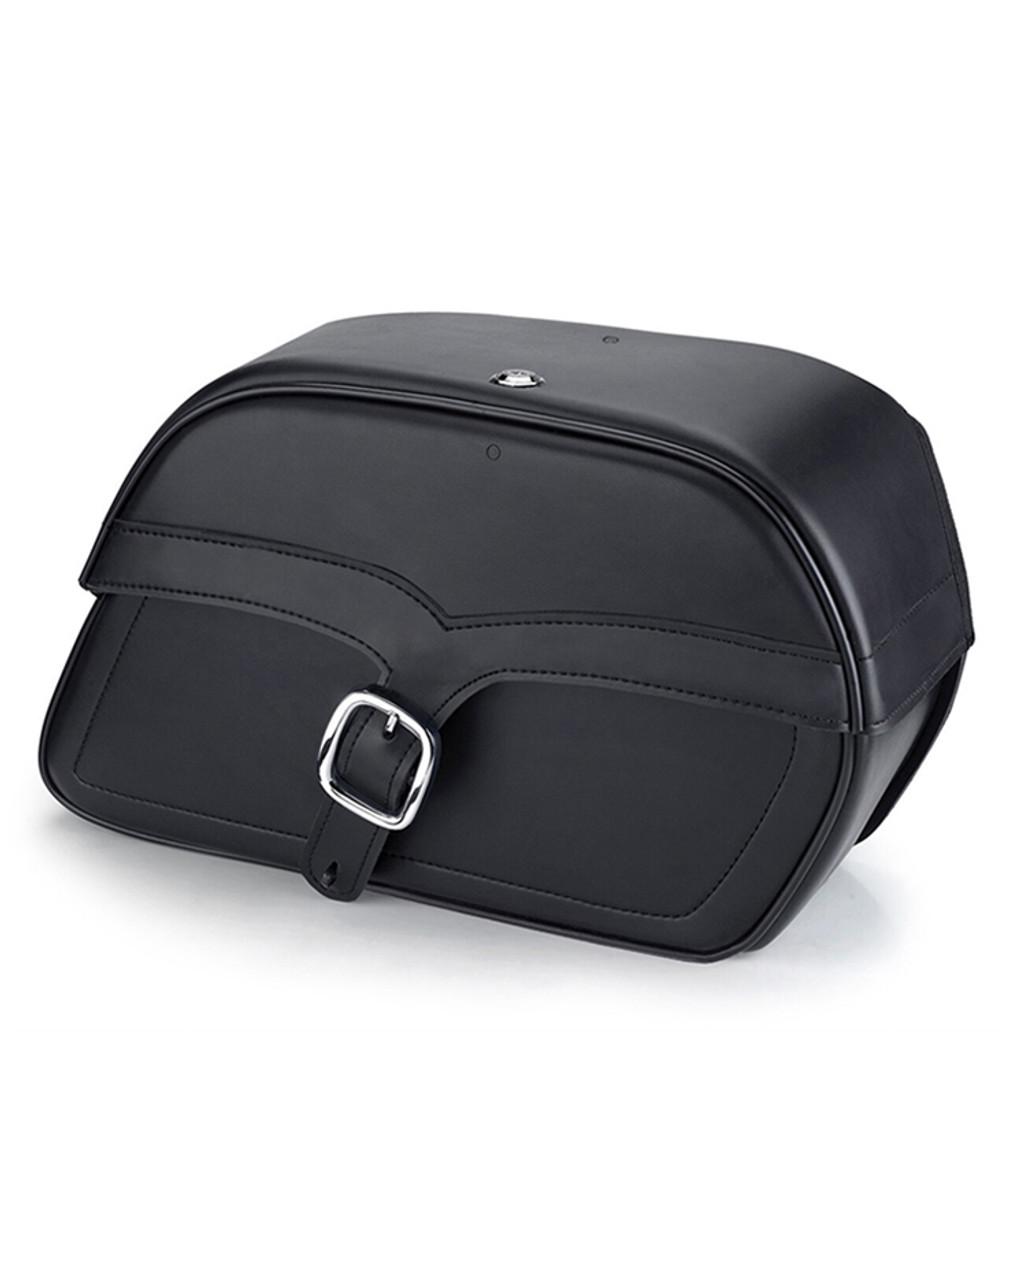 Honda 1500 Valkyrie Standard Vikingbags Shock Cutout Single Strap Large Slanted Leather Motorcycle Saddlebags Main Bag View